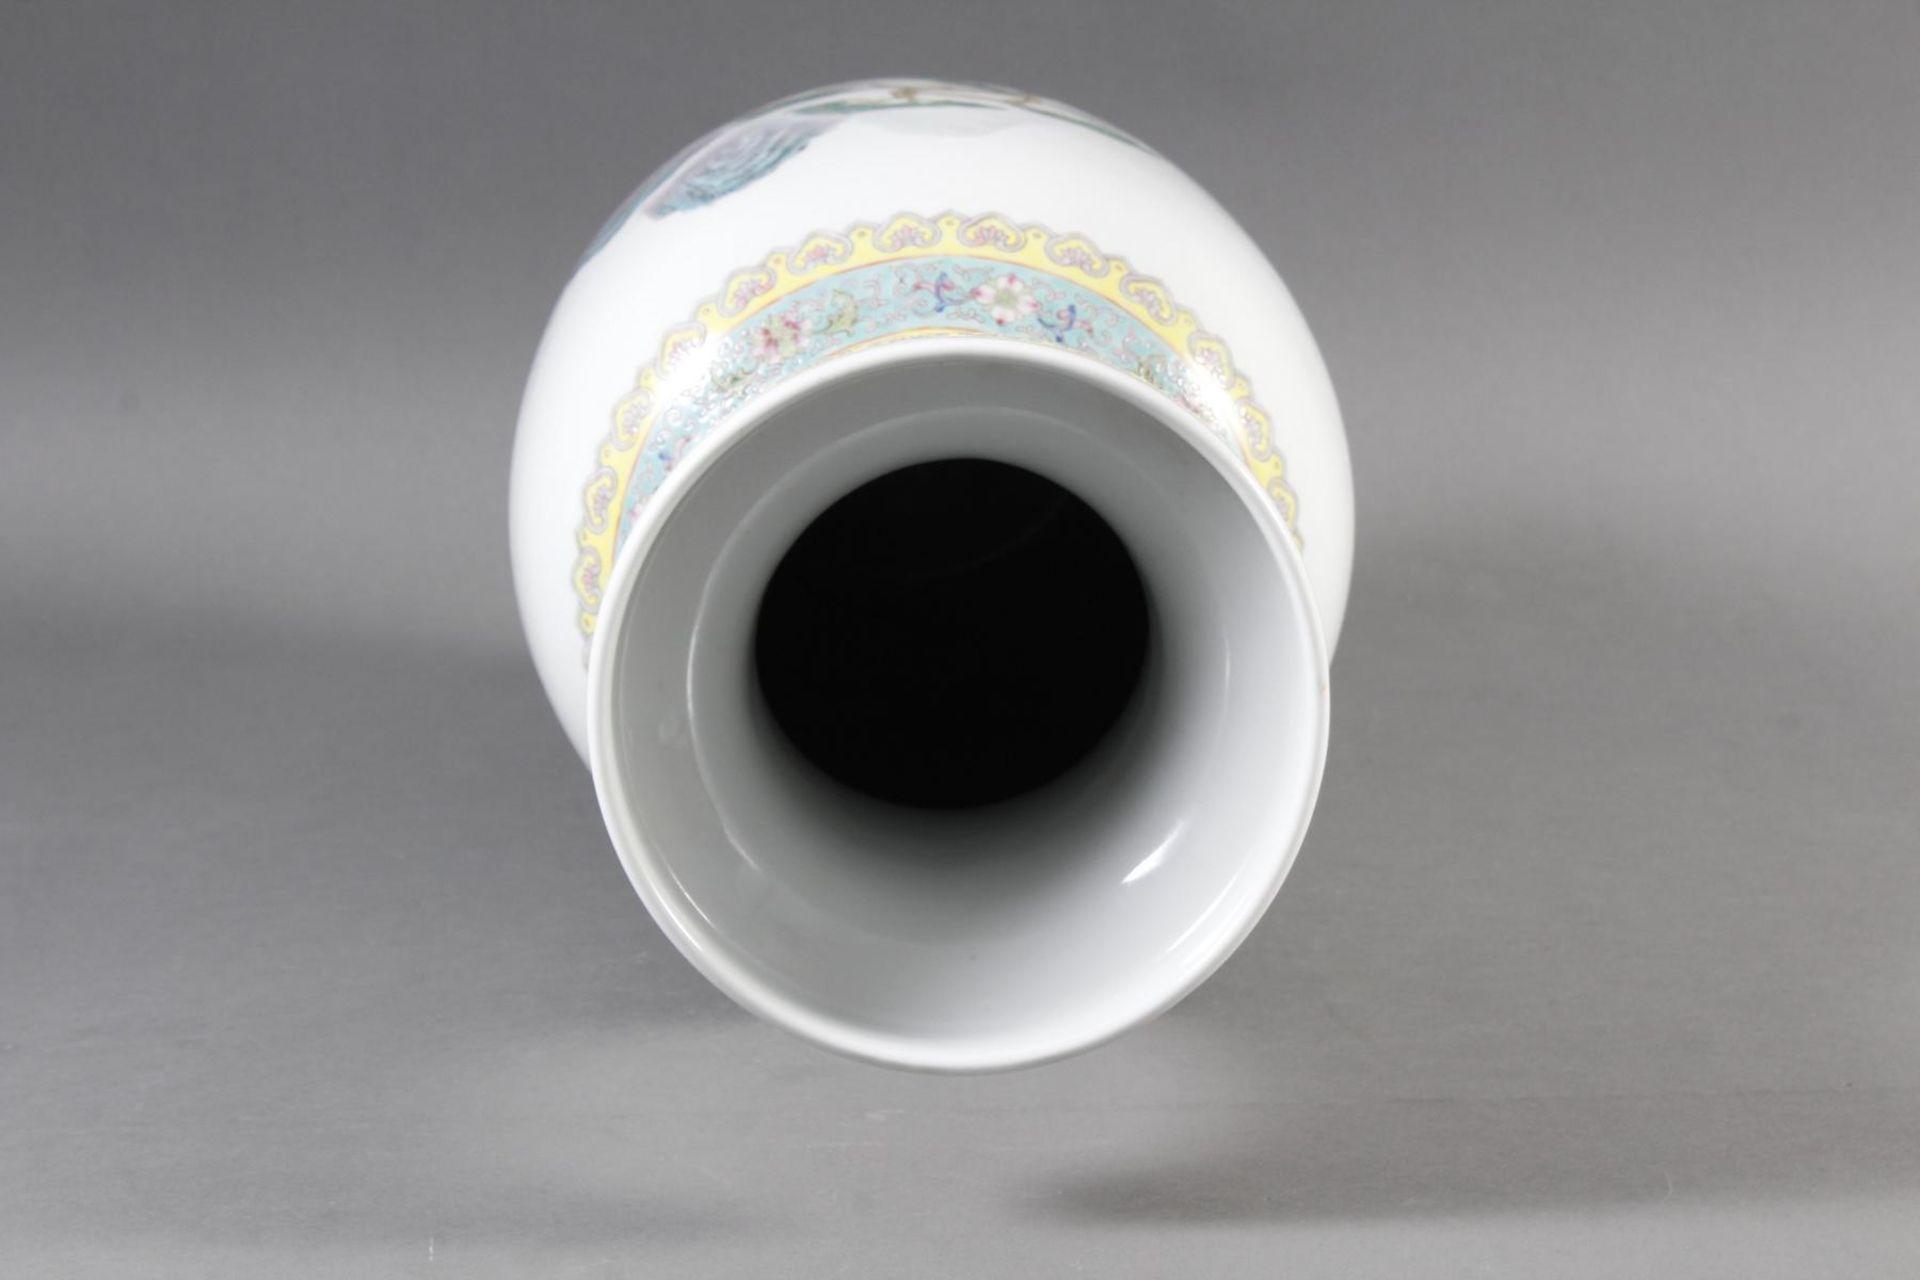 Porzellan Bodenvase, China 20. Jahrhundert - Bild 10 aus 12